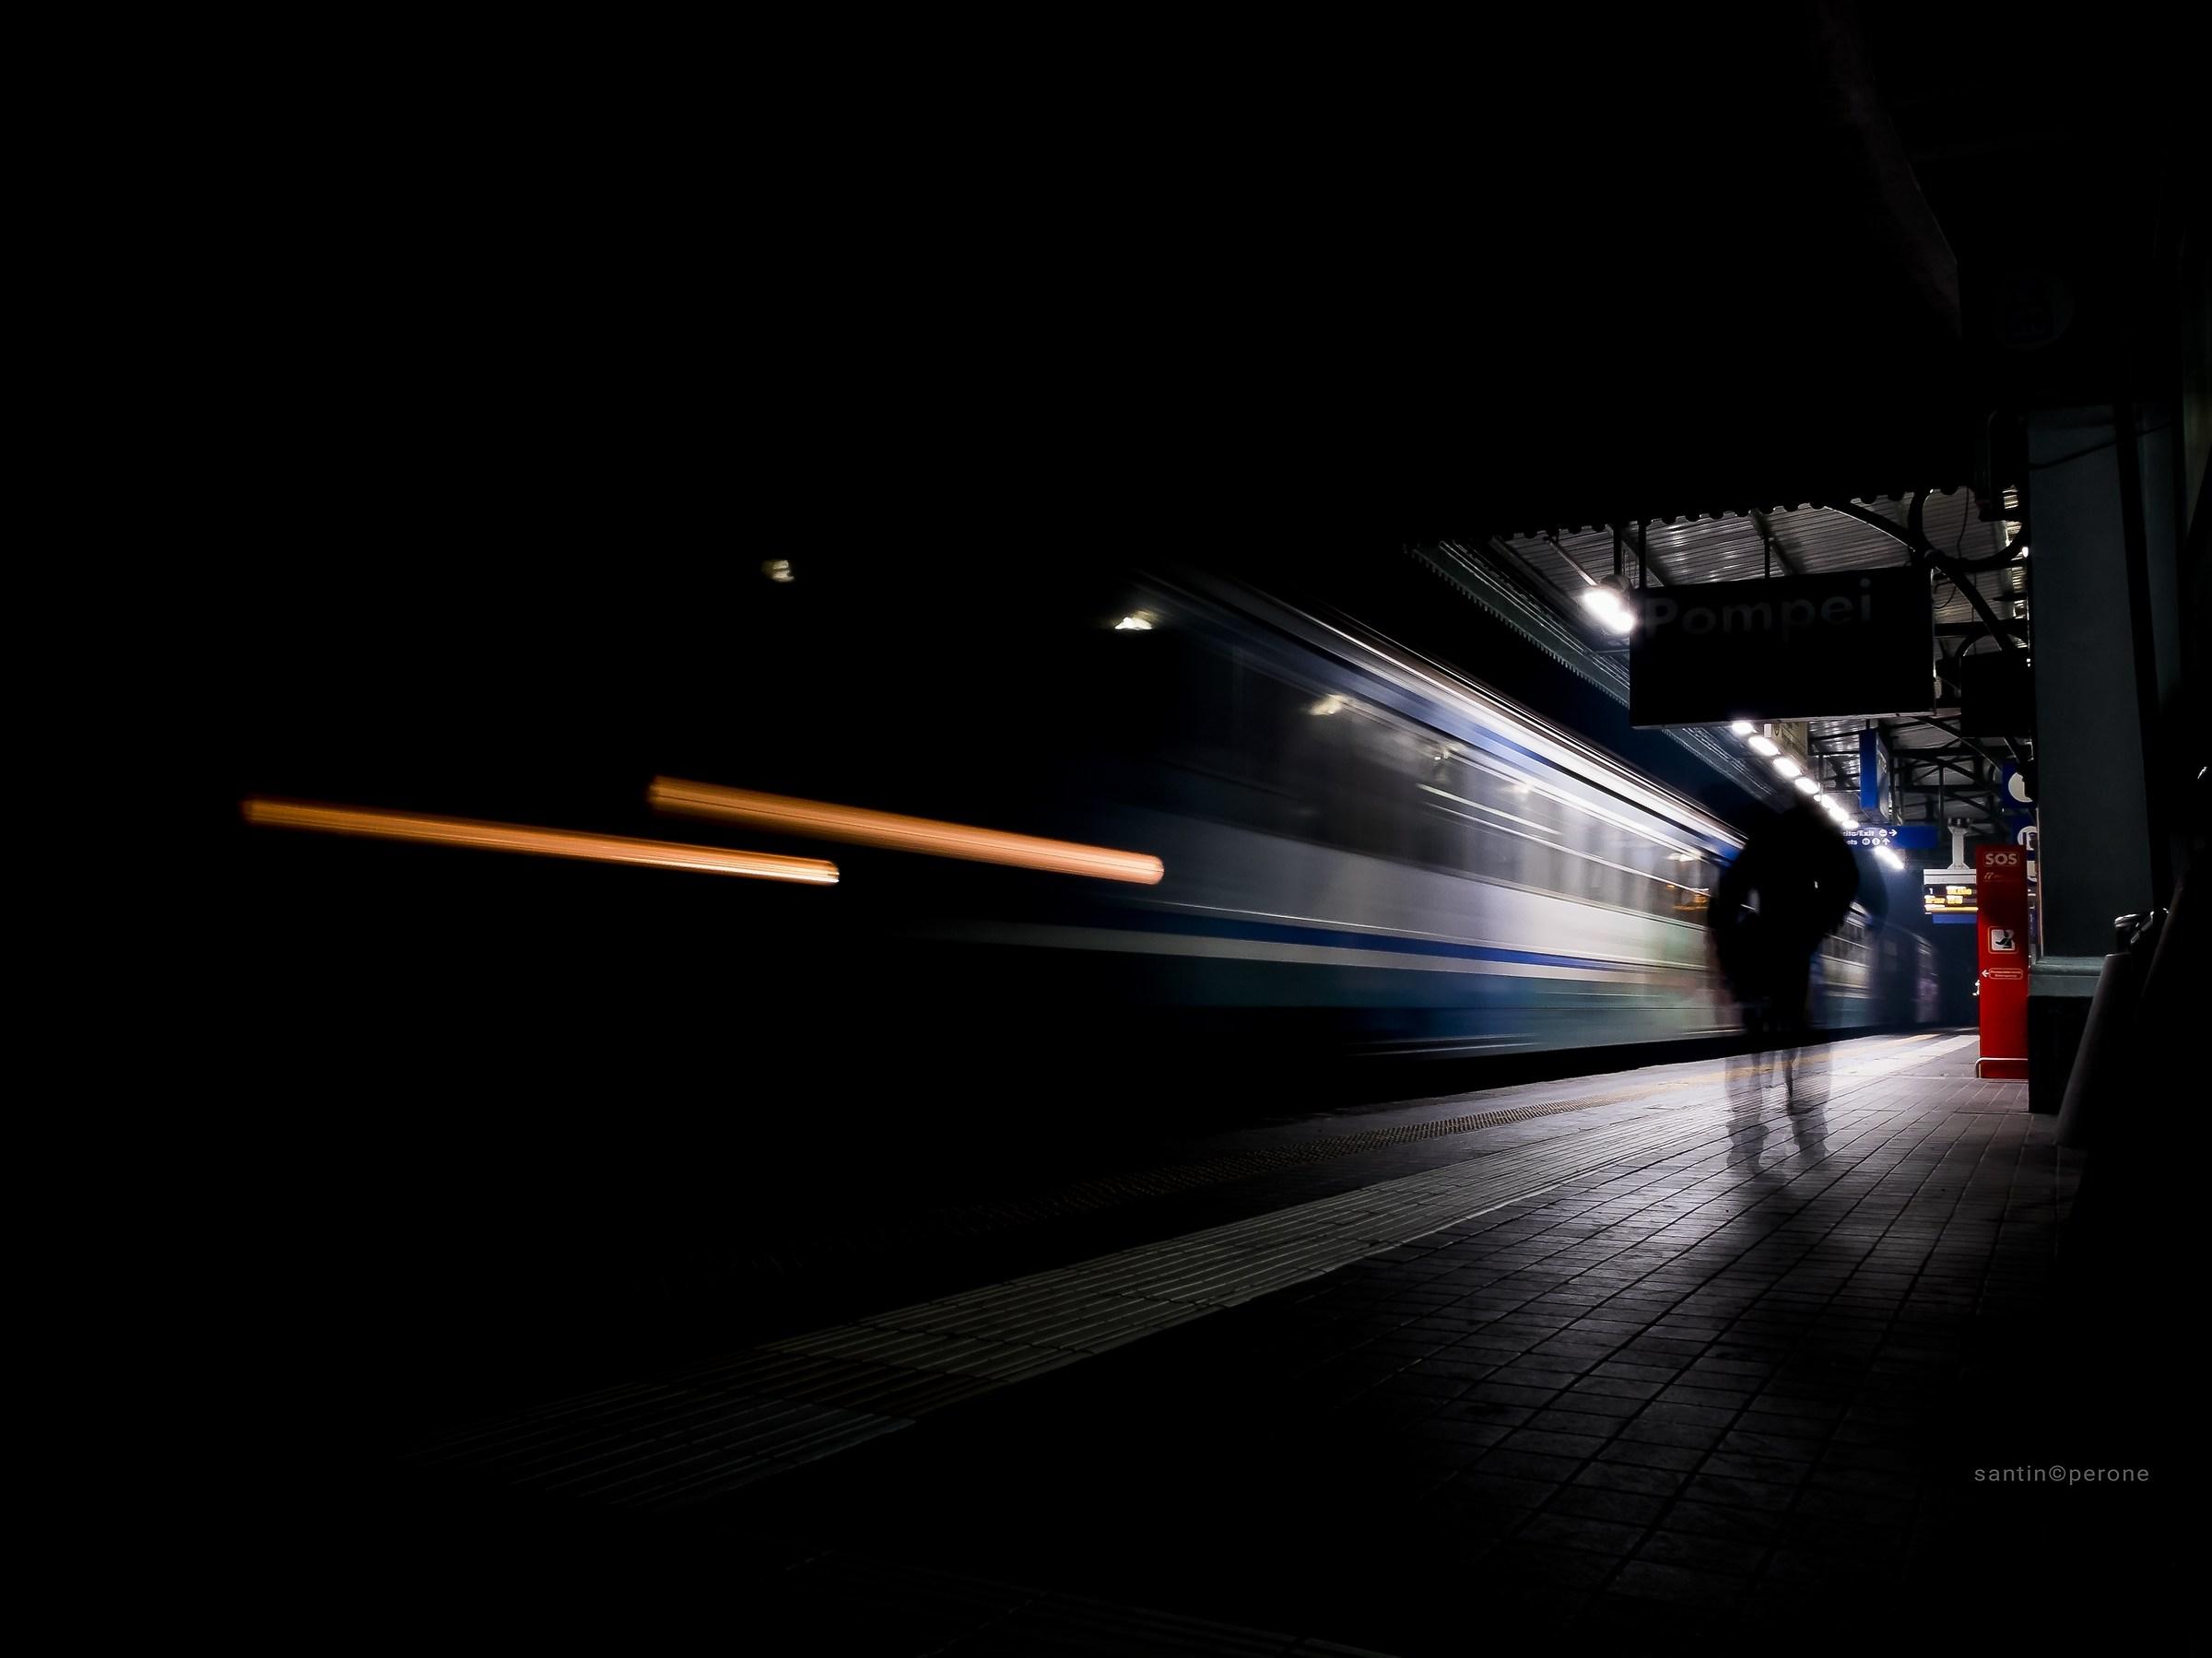 Goast train...